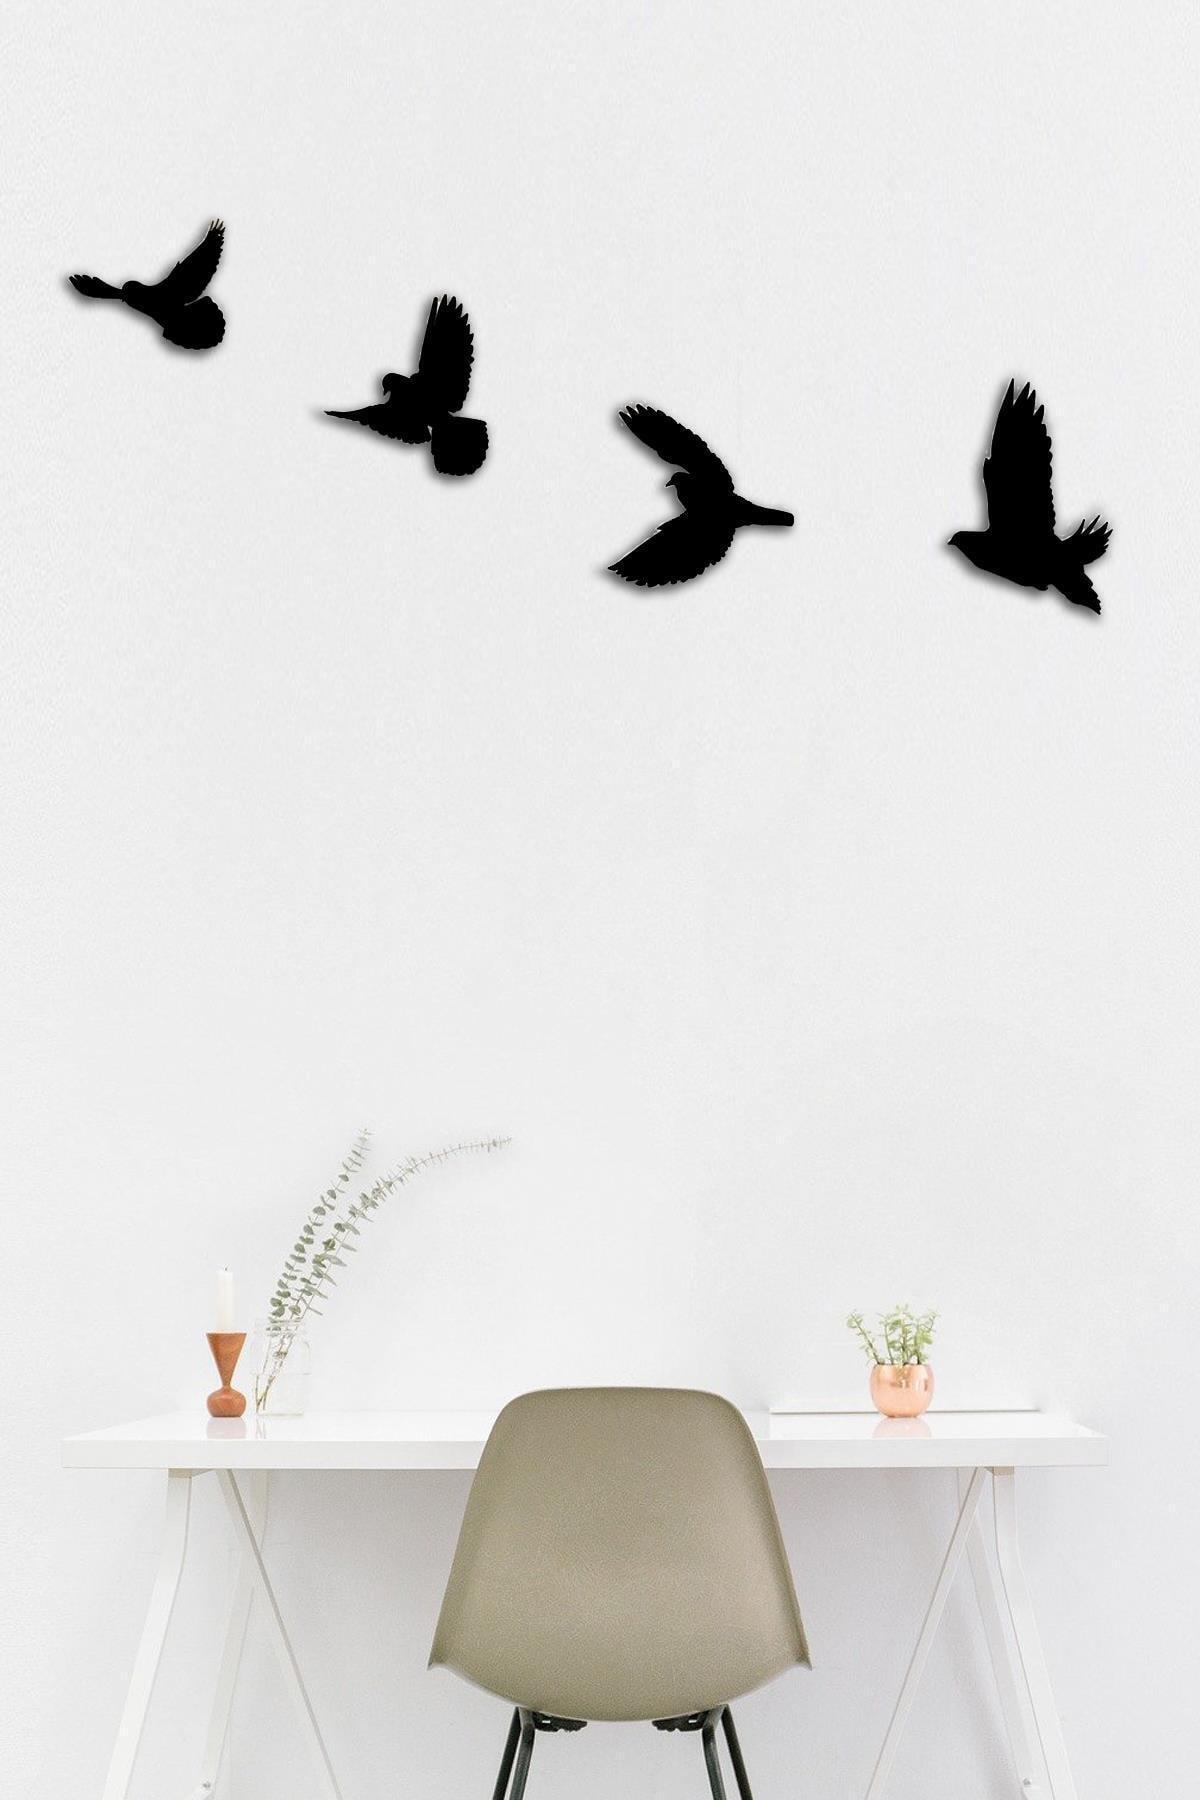 Dekolia Ahşap Dörtlü Kuş Duvar Süsü Lazer Kesim Duvar Dekoru Art1233 1